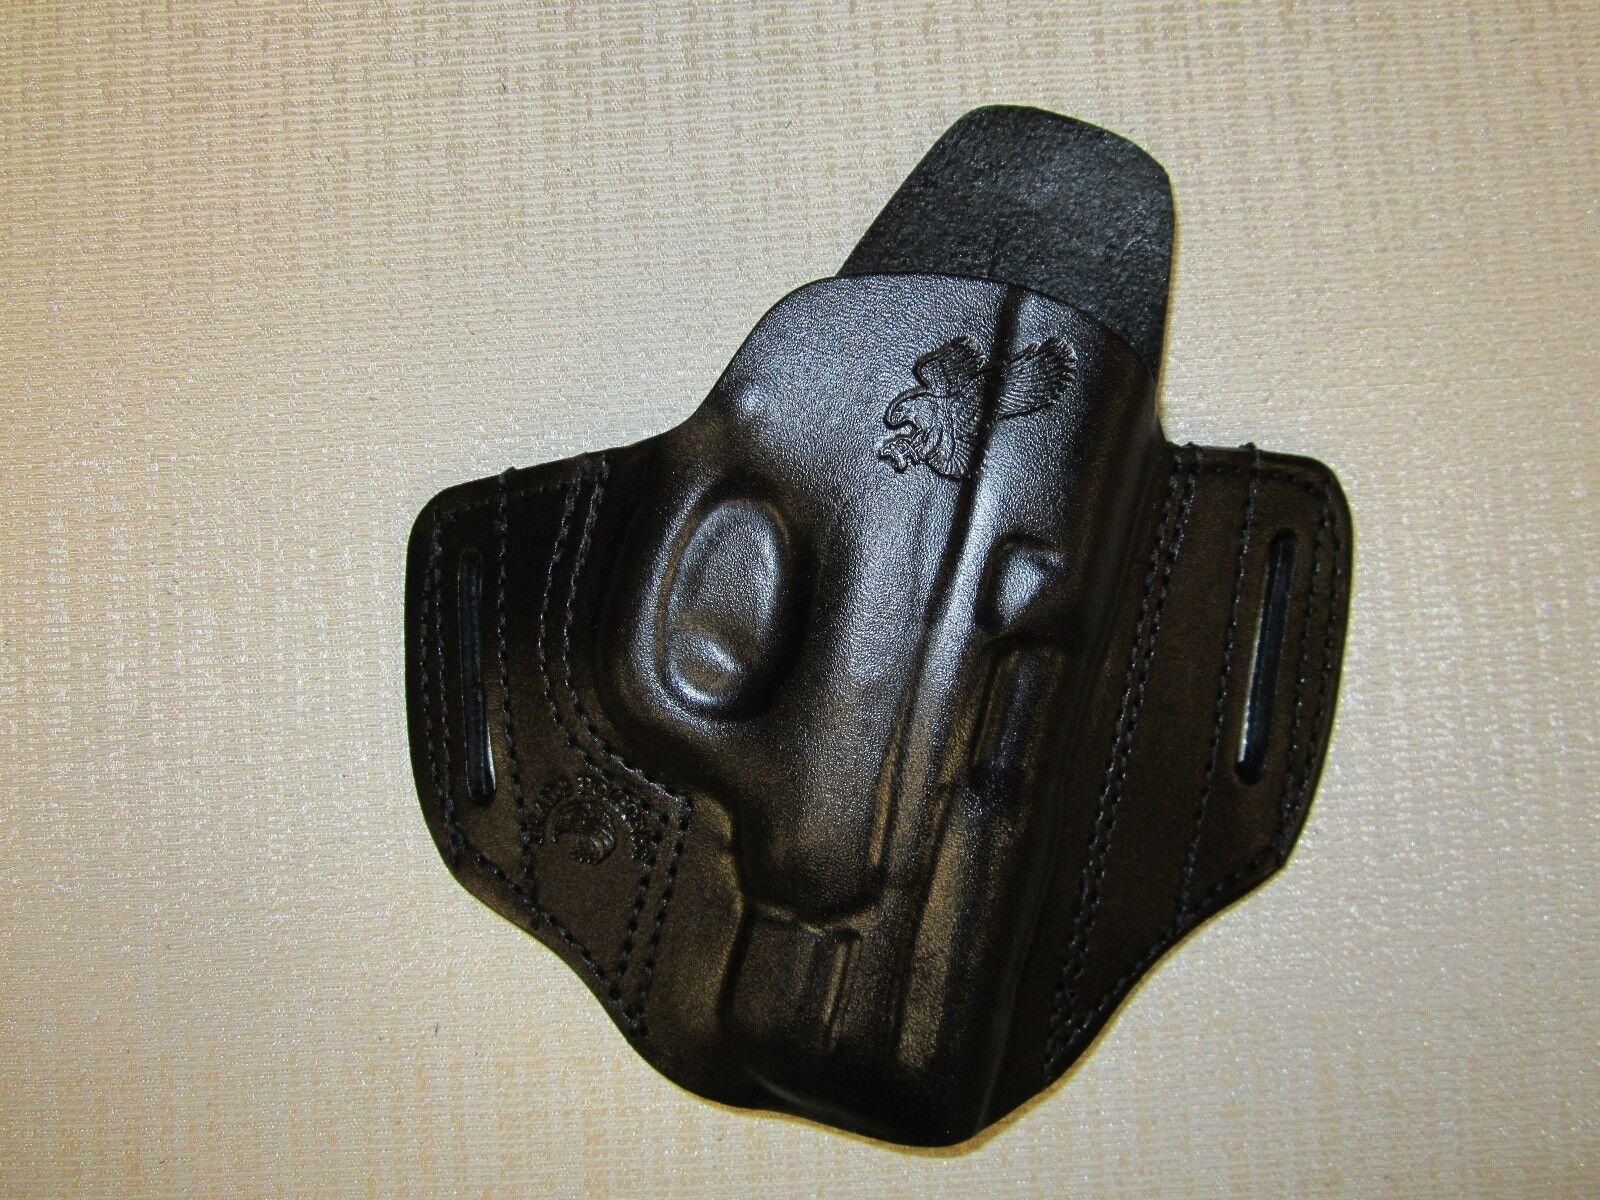 S&W M&P SHIELD 3.3 45 Cal. formed Leder pancake owb slide Leder belt slide owb holster 2bcfcd